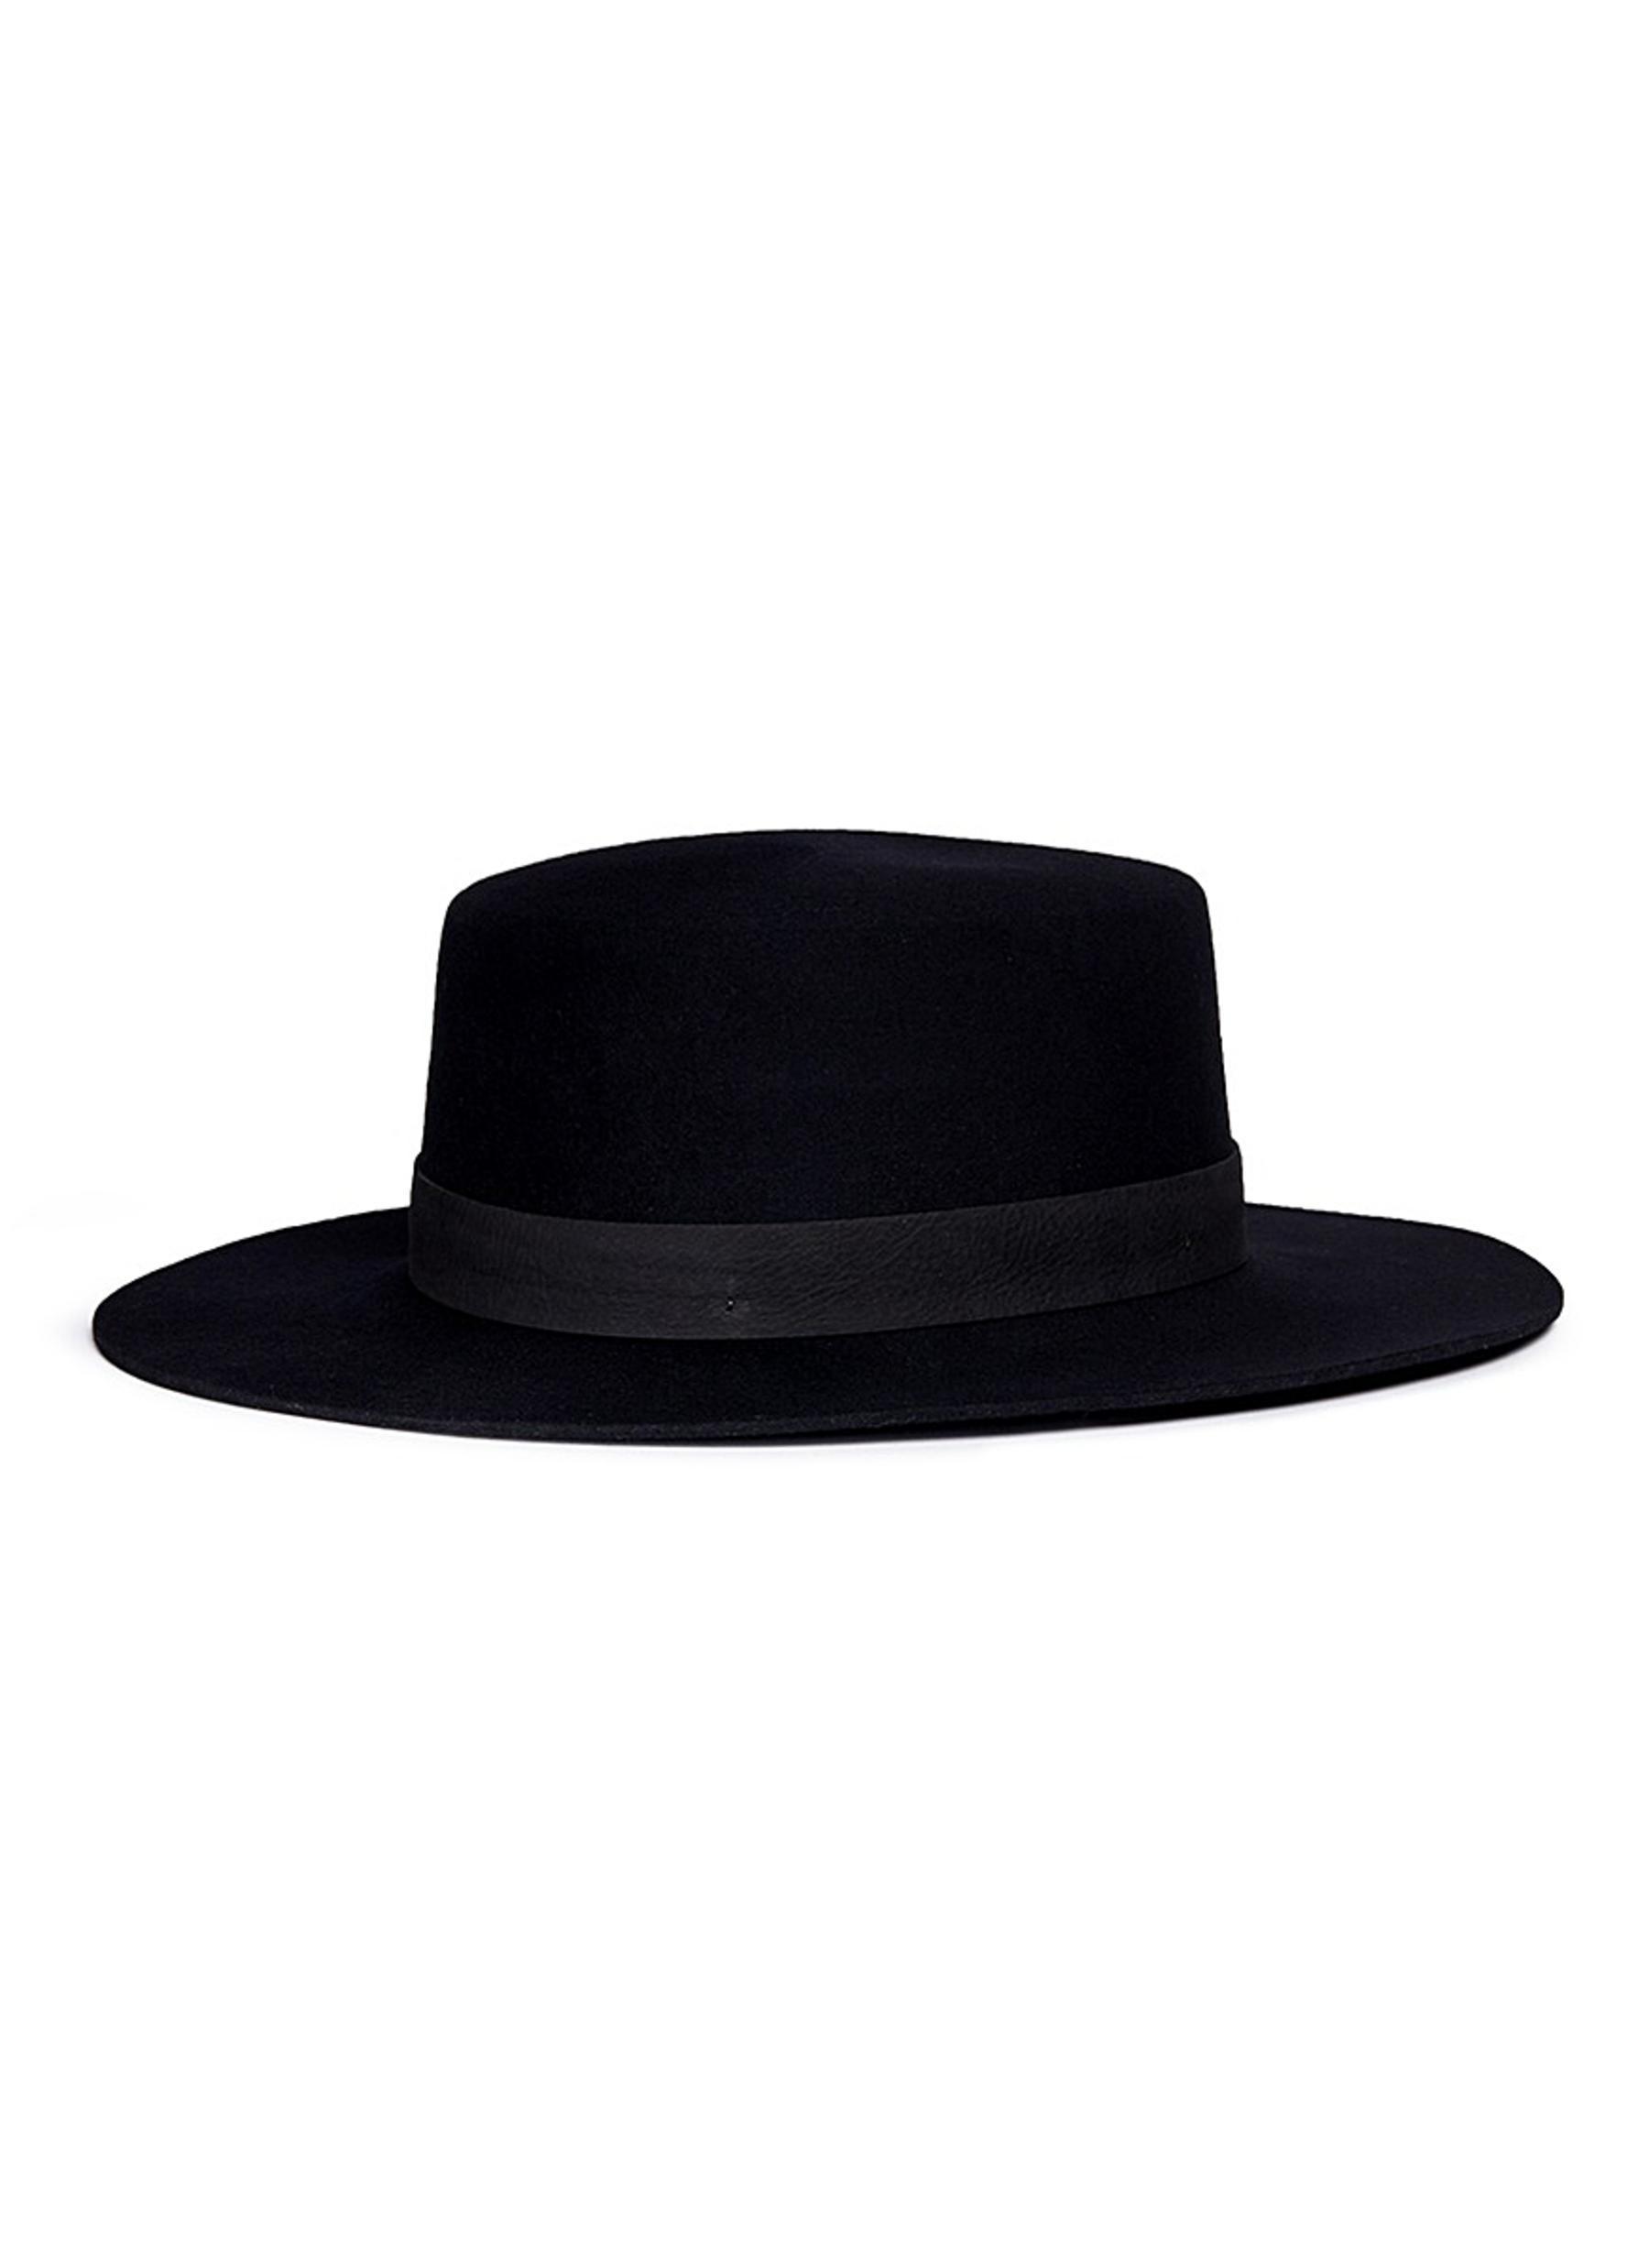 c946ea53 Lyst - Janessa Leone 'gabrielle' Suede Band Wool Felt Bolero Hat in ...